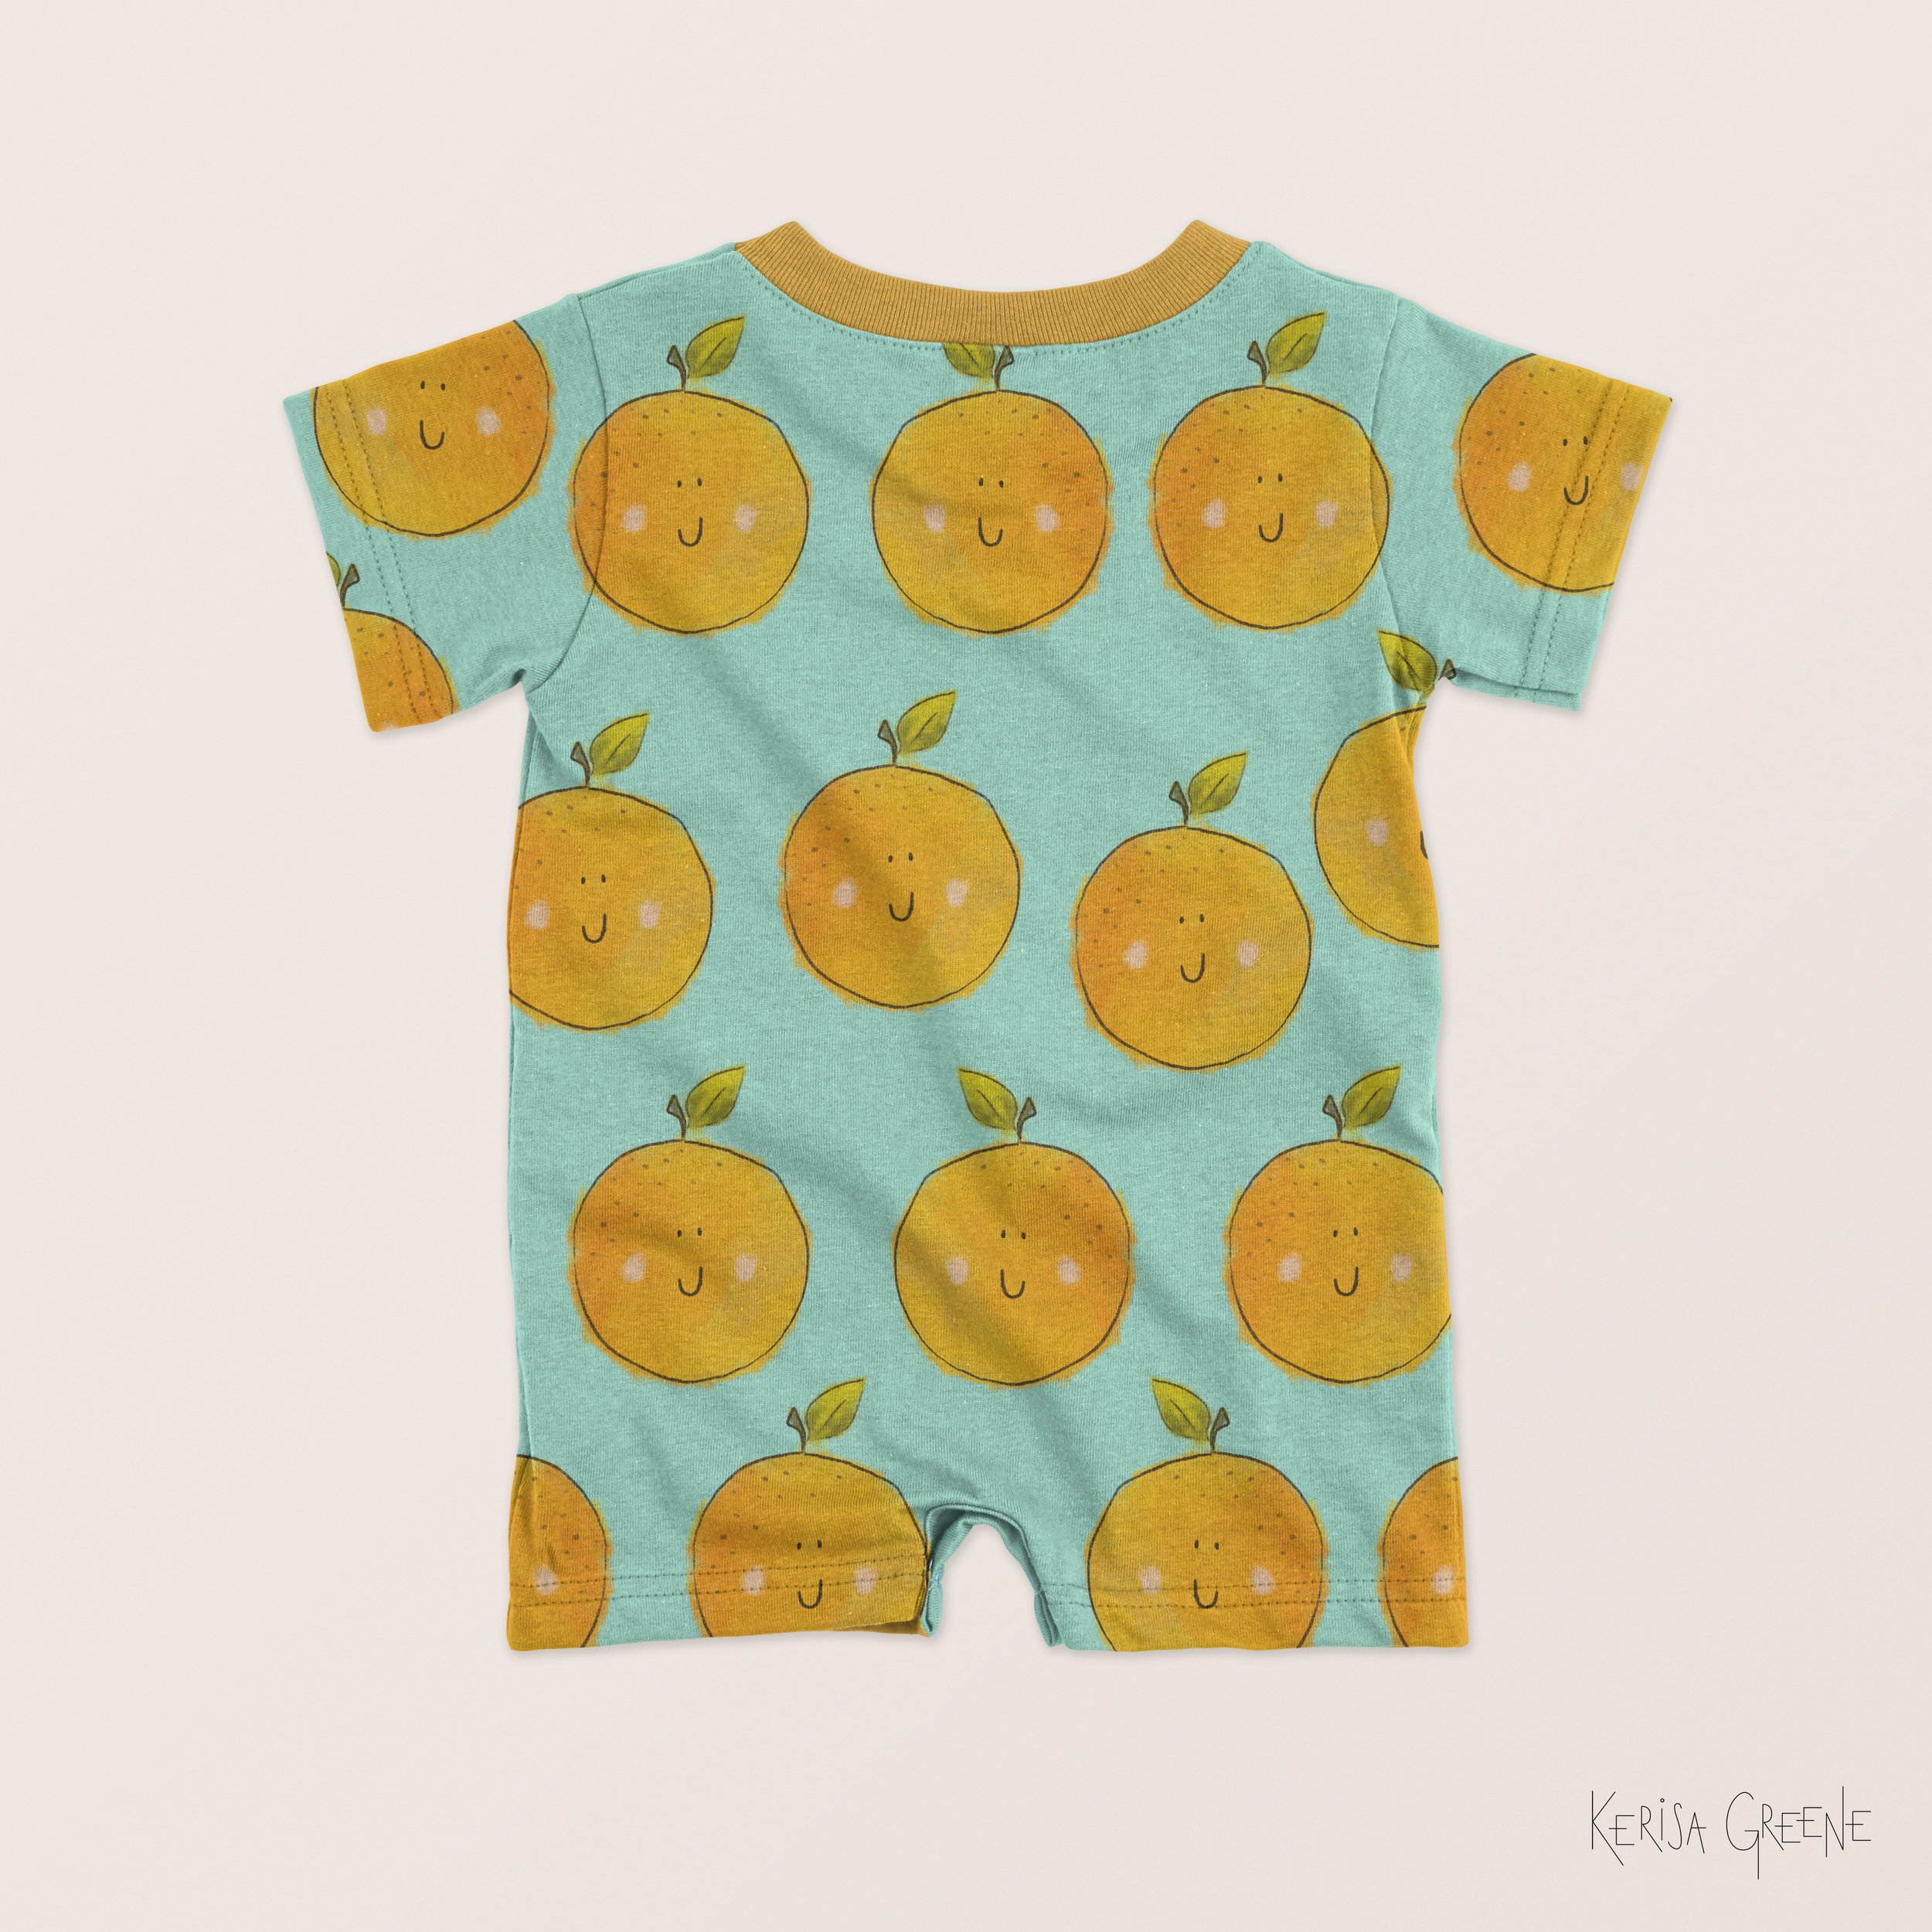 Cute Kids Baby Surface Pattern Design Clementine Orange Print Illustration By Kerisa Greene